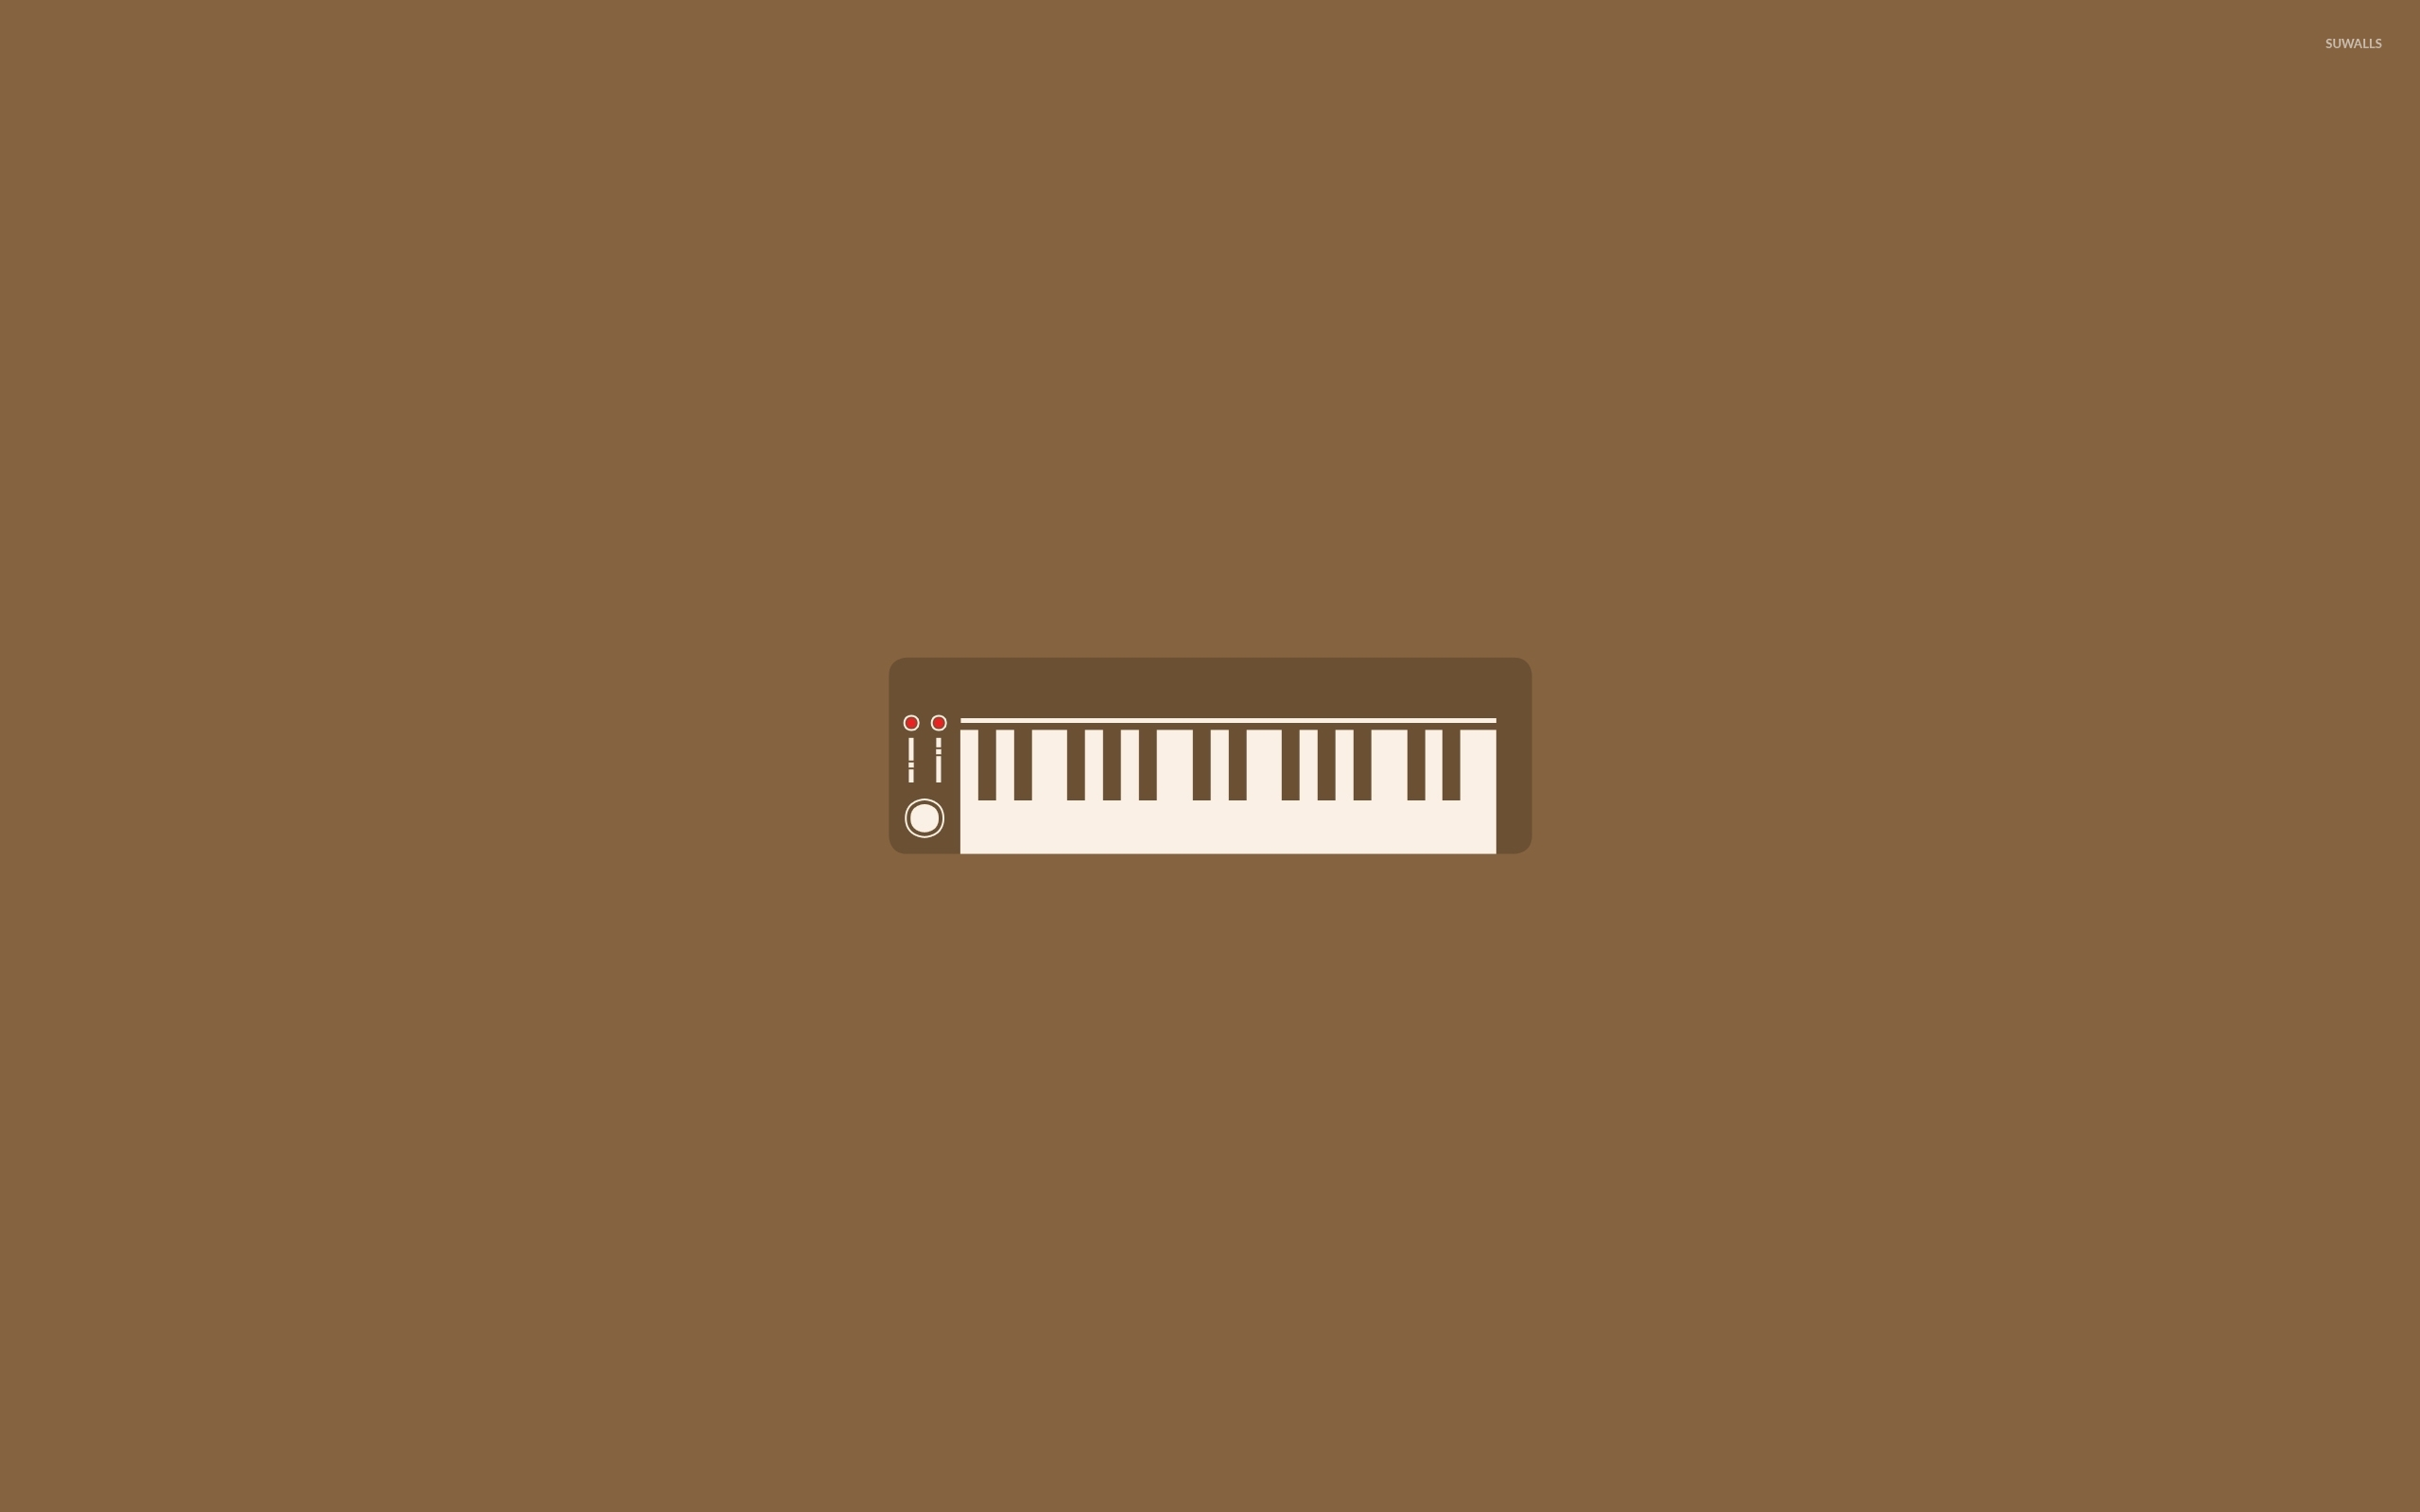 Electric Piano Wallpaper Minimalistic Wallpapers 42815